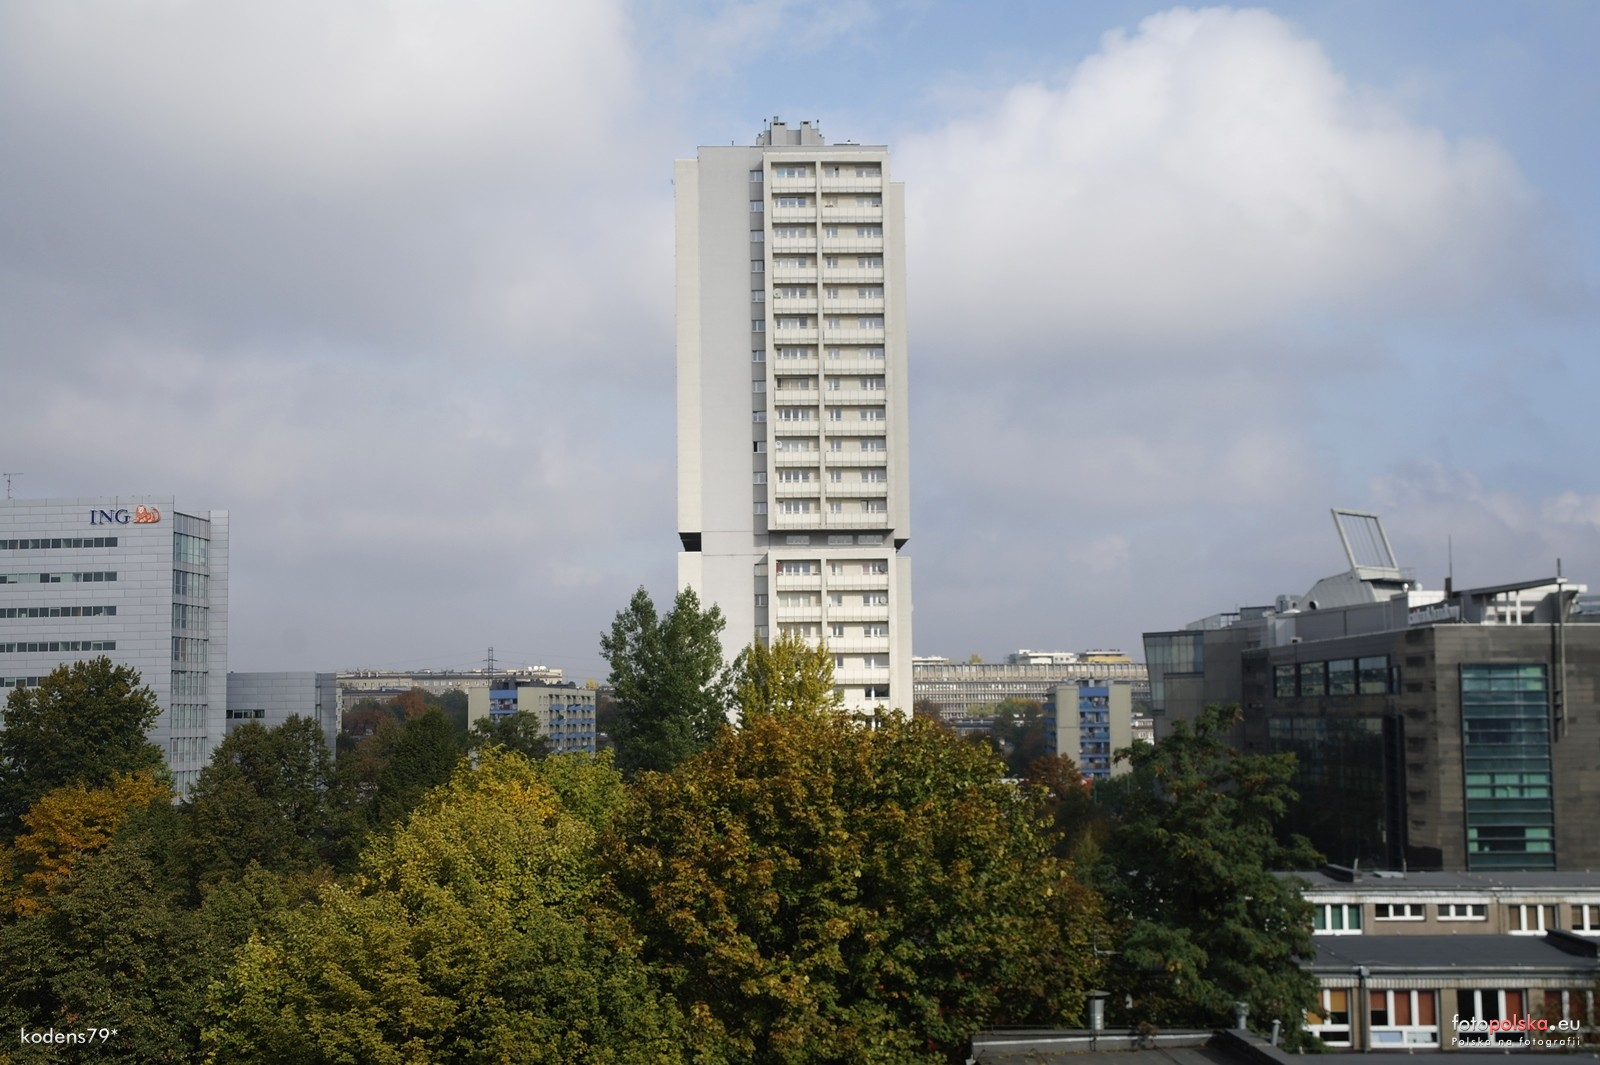 kodens79, Fotopolska-Eu